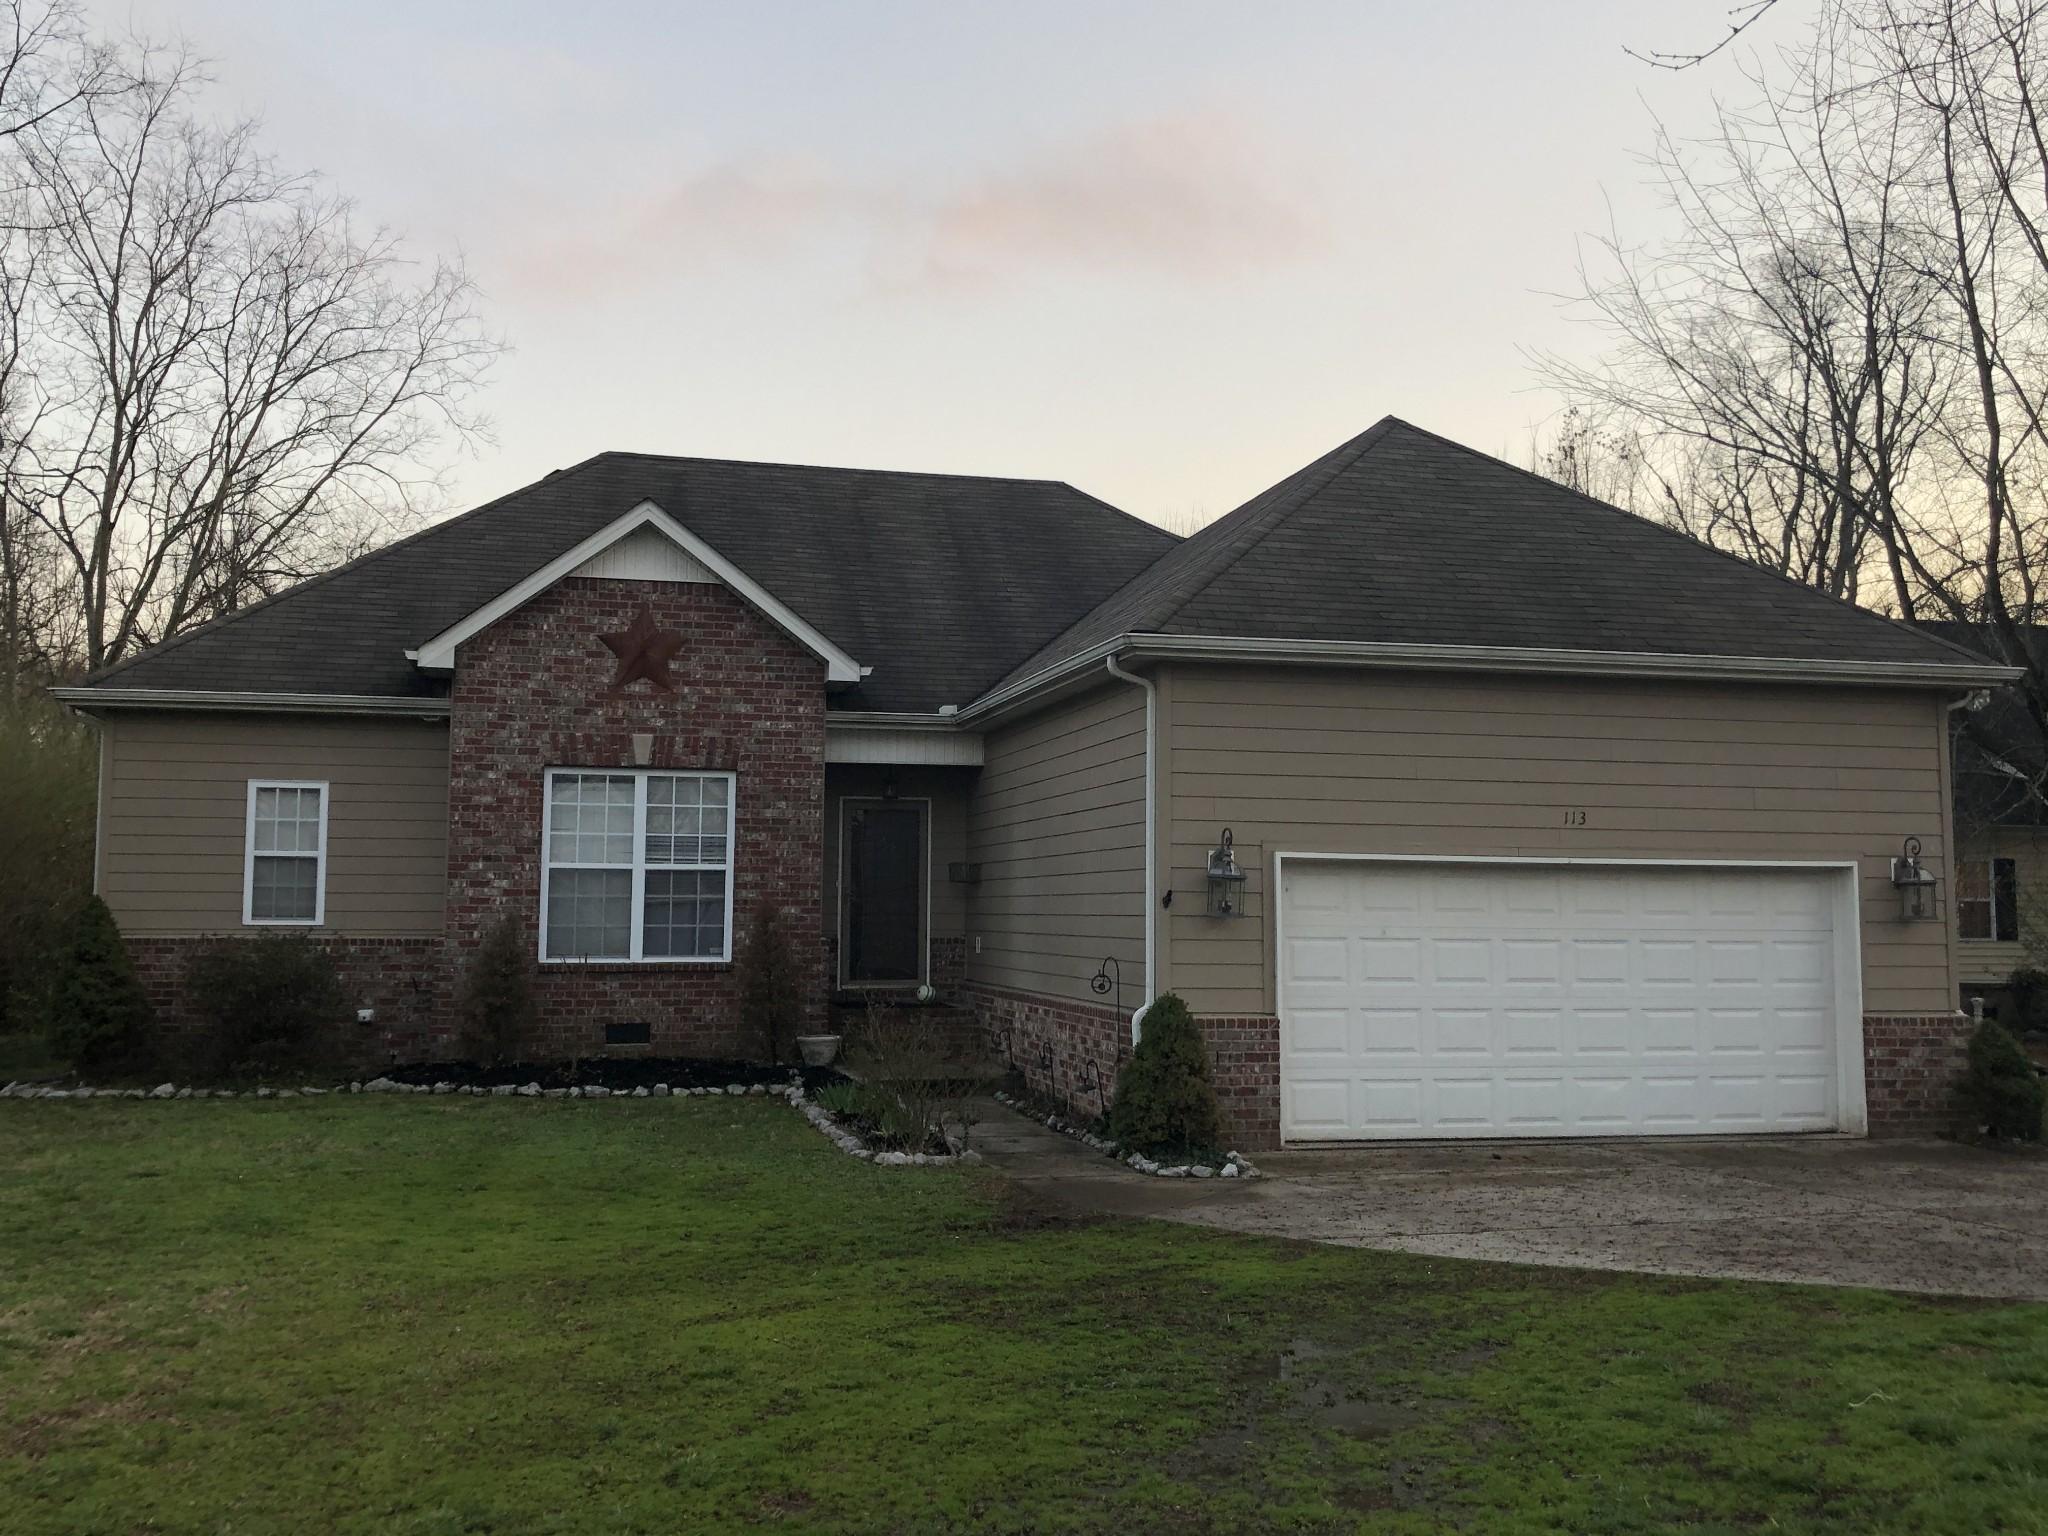 113 Church St, Smyrna, TN 37167 - Smyrna, TN real estate listing